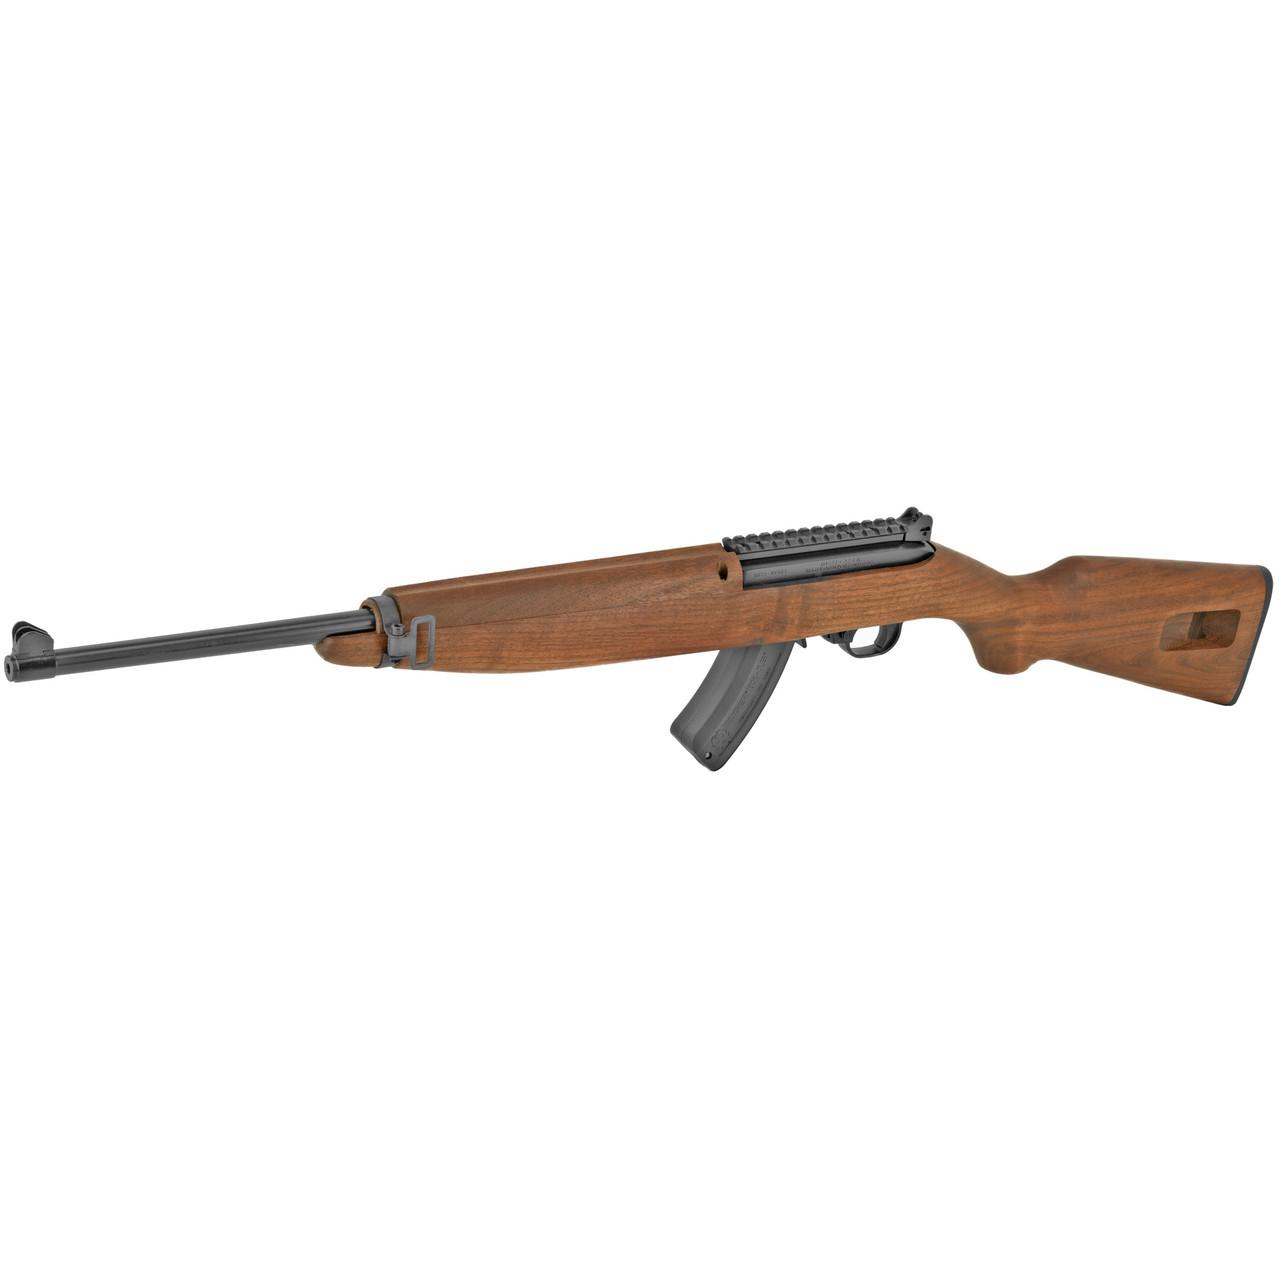 Ruger 10/22 M1 Carbine TALO Exclusive CALIFORNIA LEGAL - .22LR - Wood